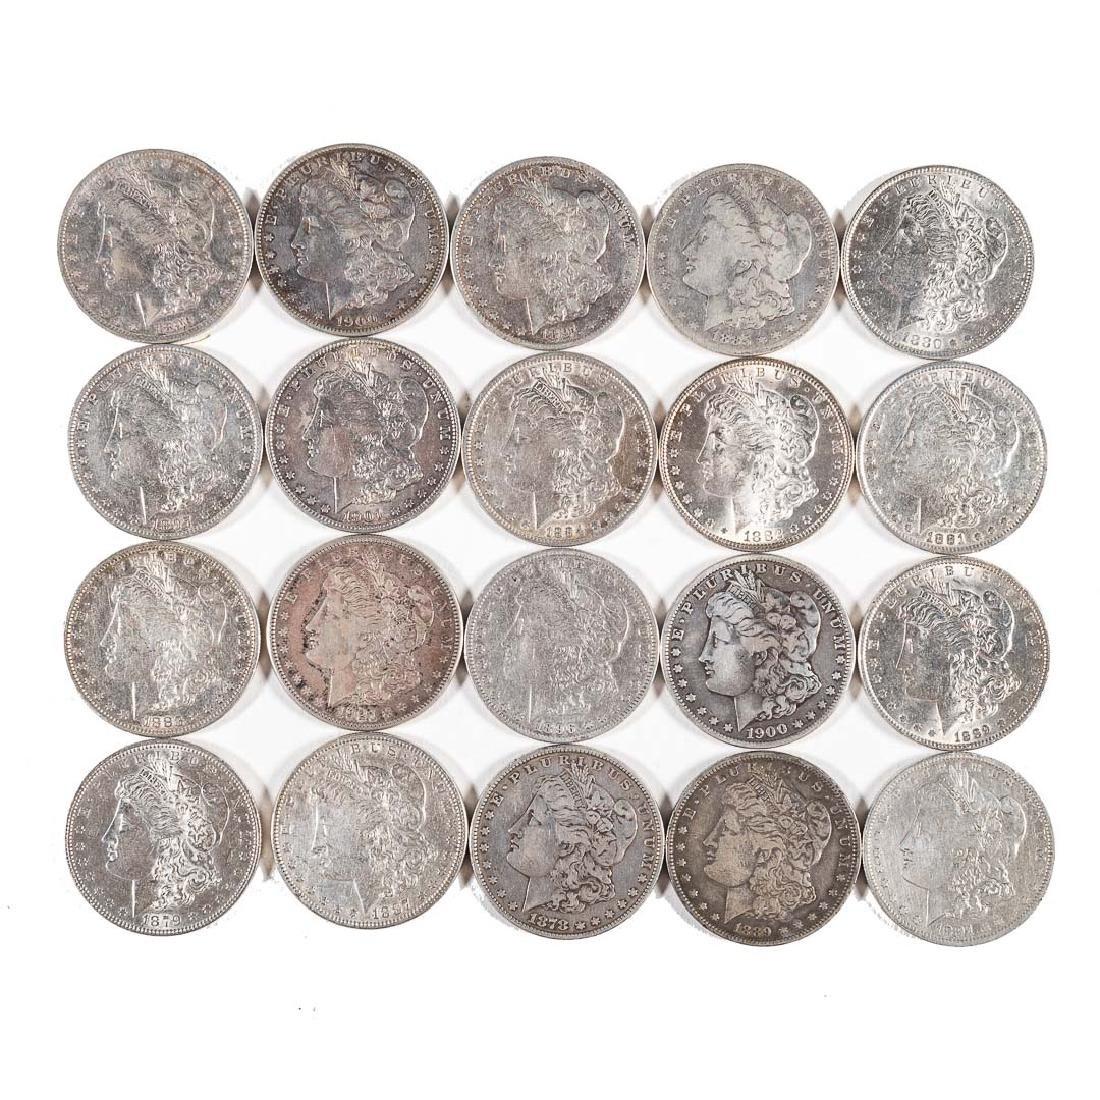 [US] 20 Different Morgan Silver Dollars